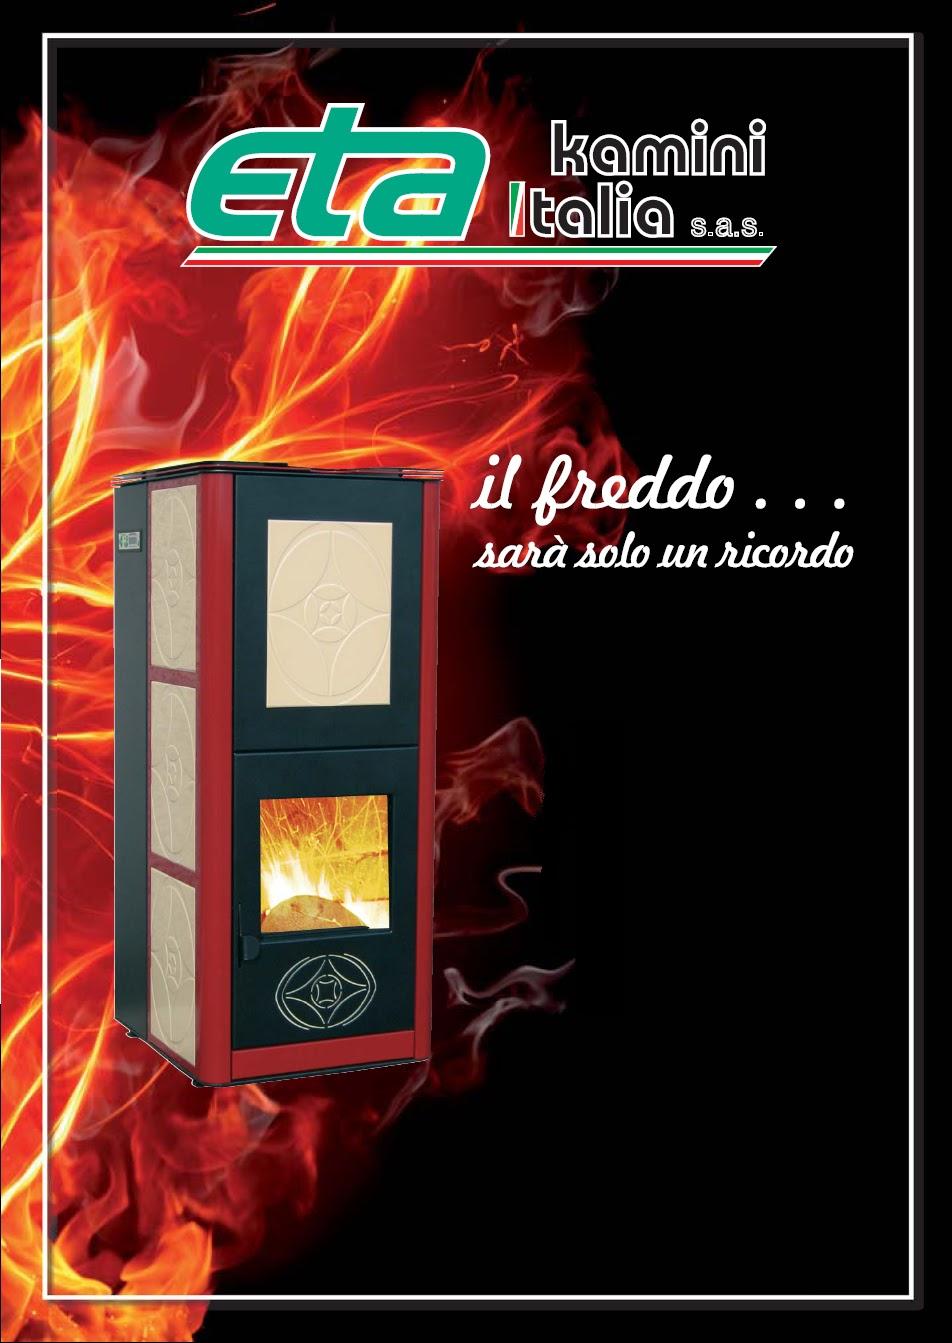 La eta kamini italia s a s termostufe e stufe a pellet for Eta kamini